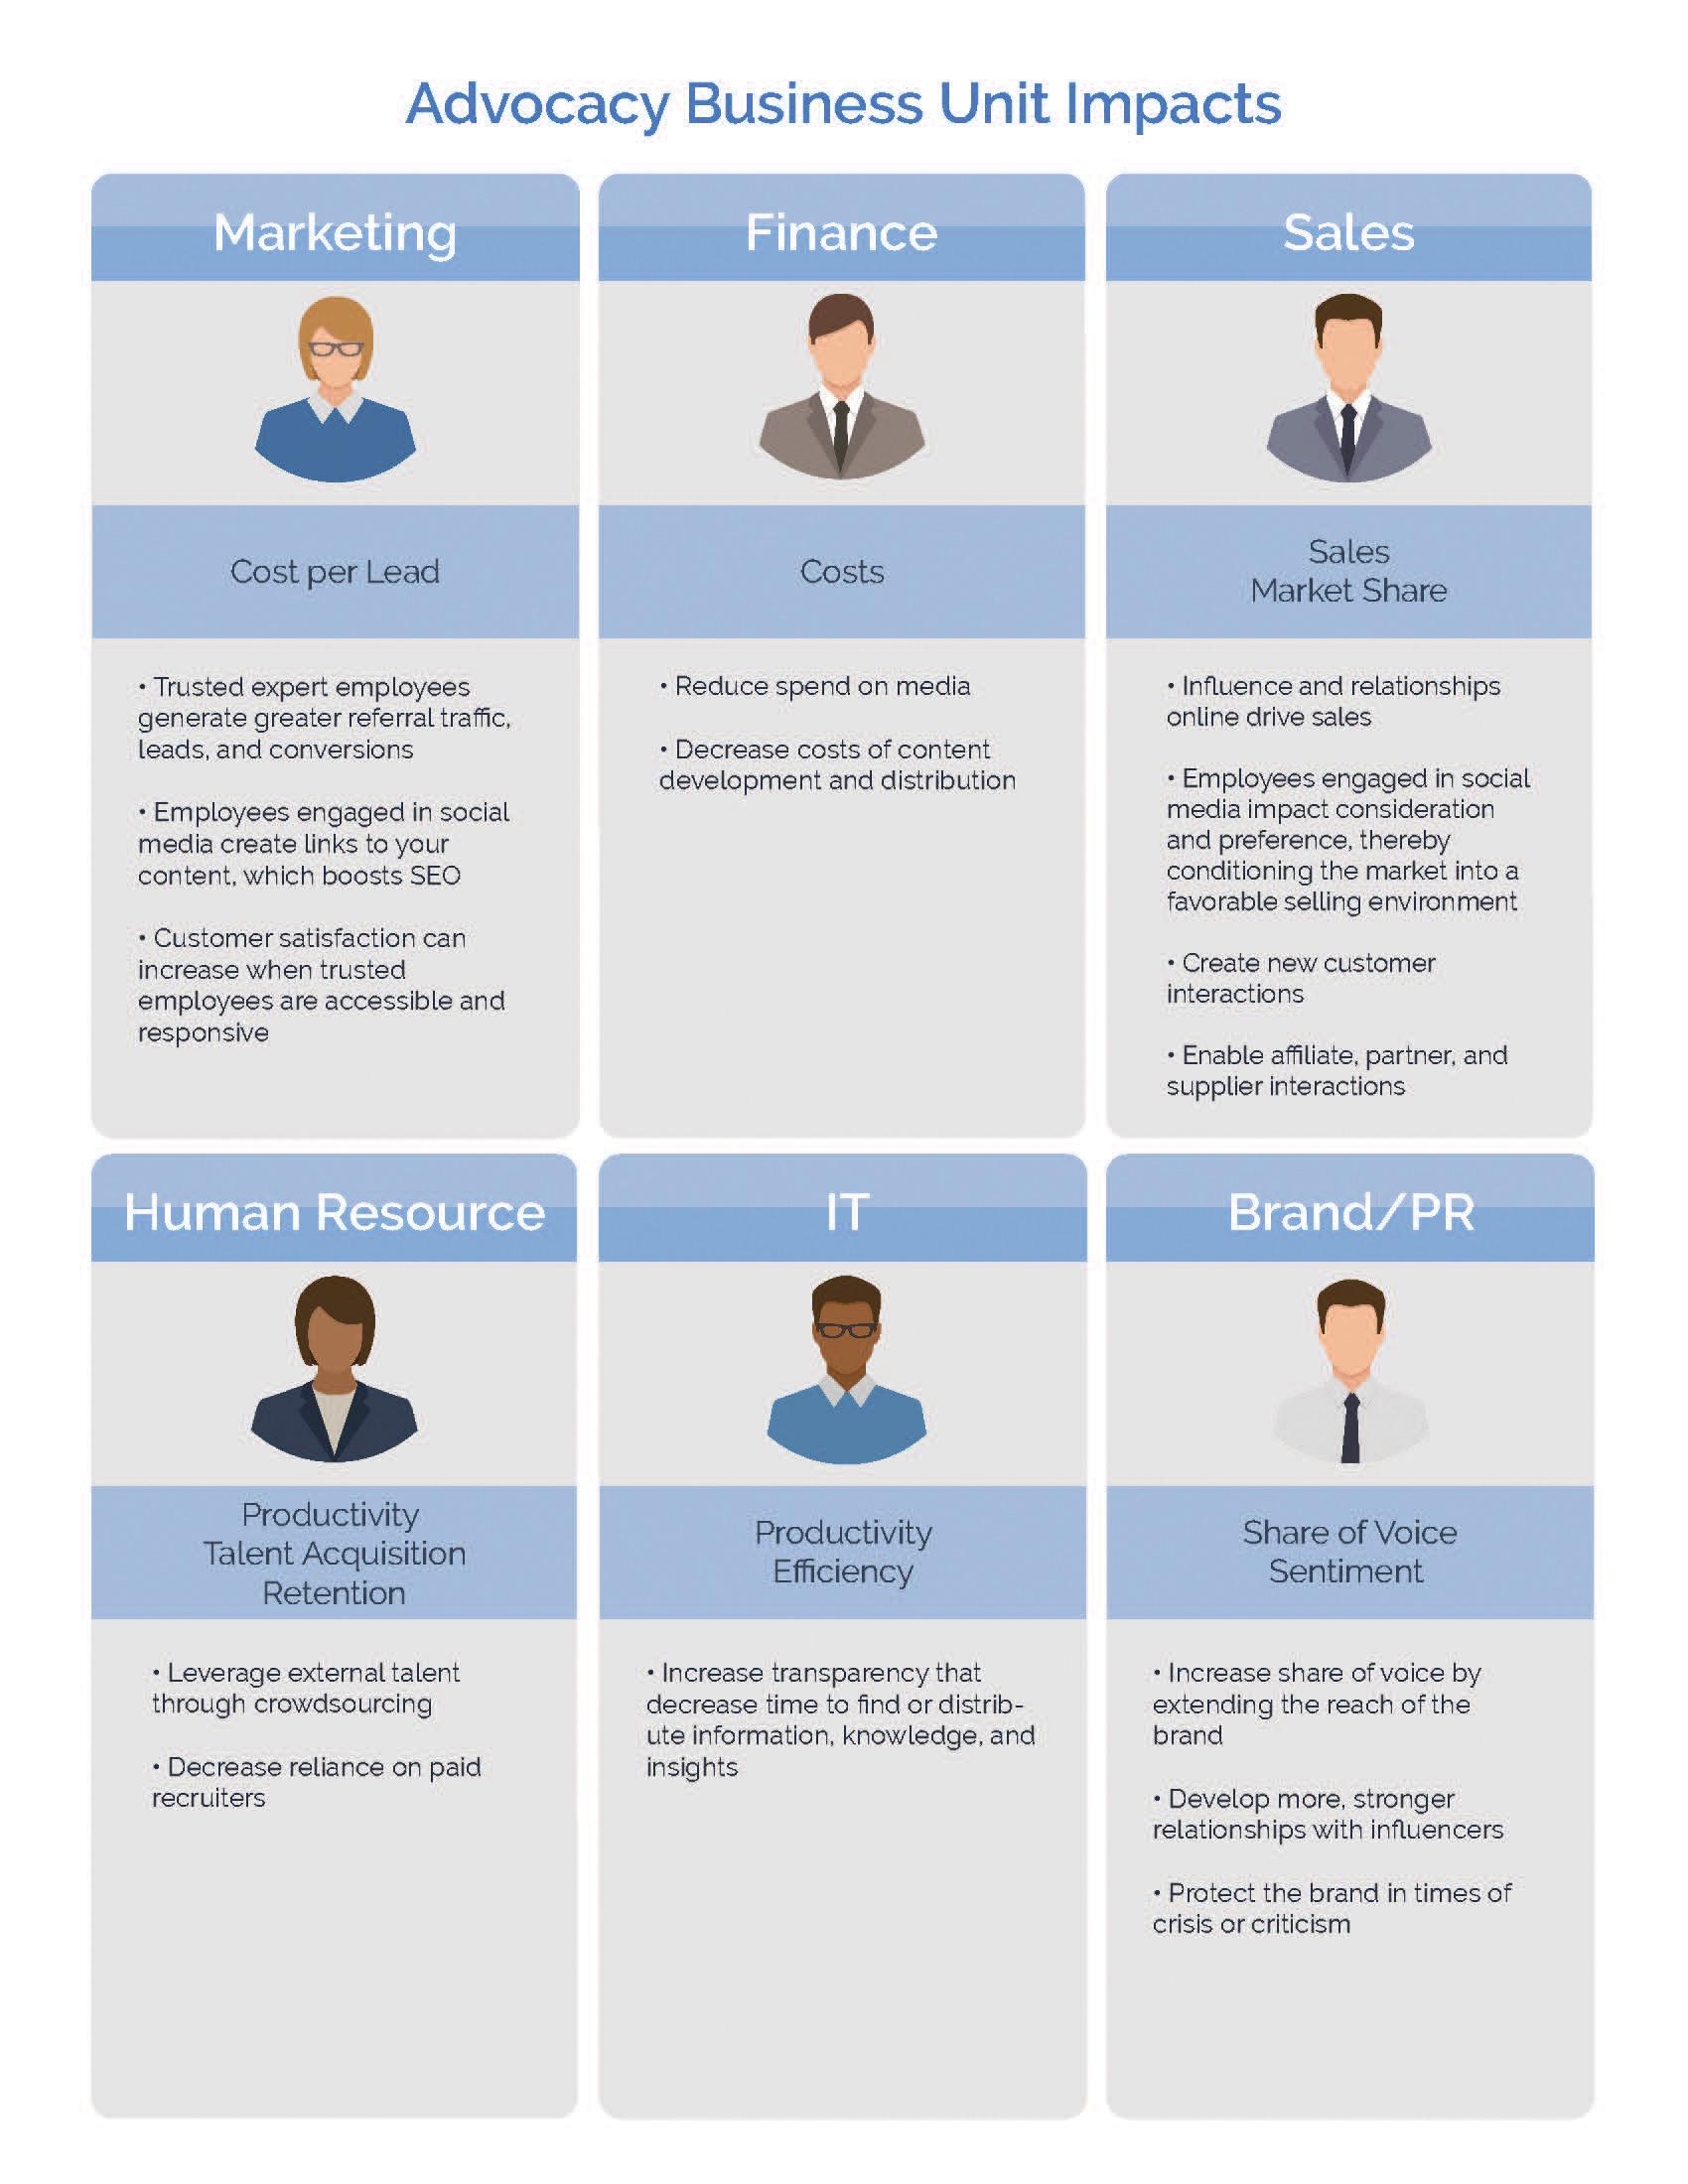 measure employee advocacy Employee Advocacy Business Units